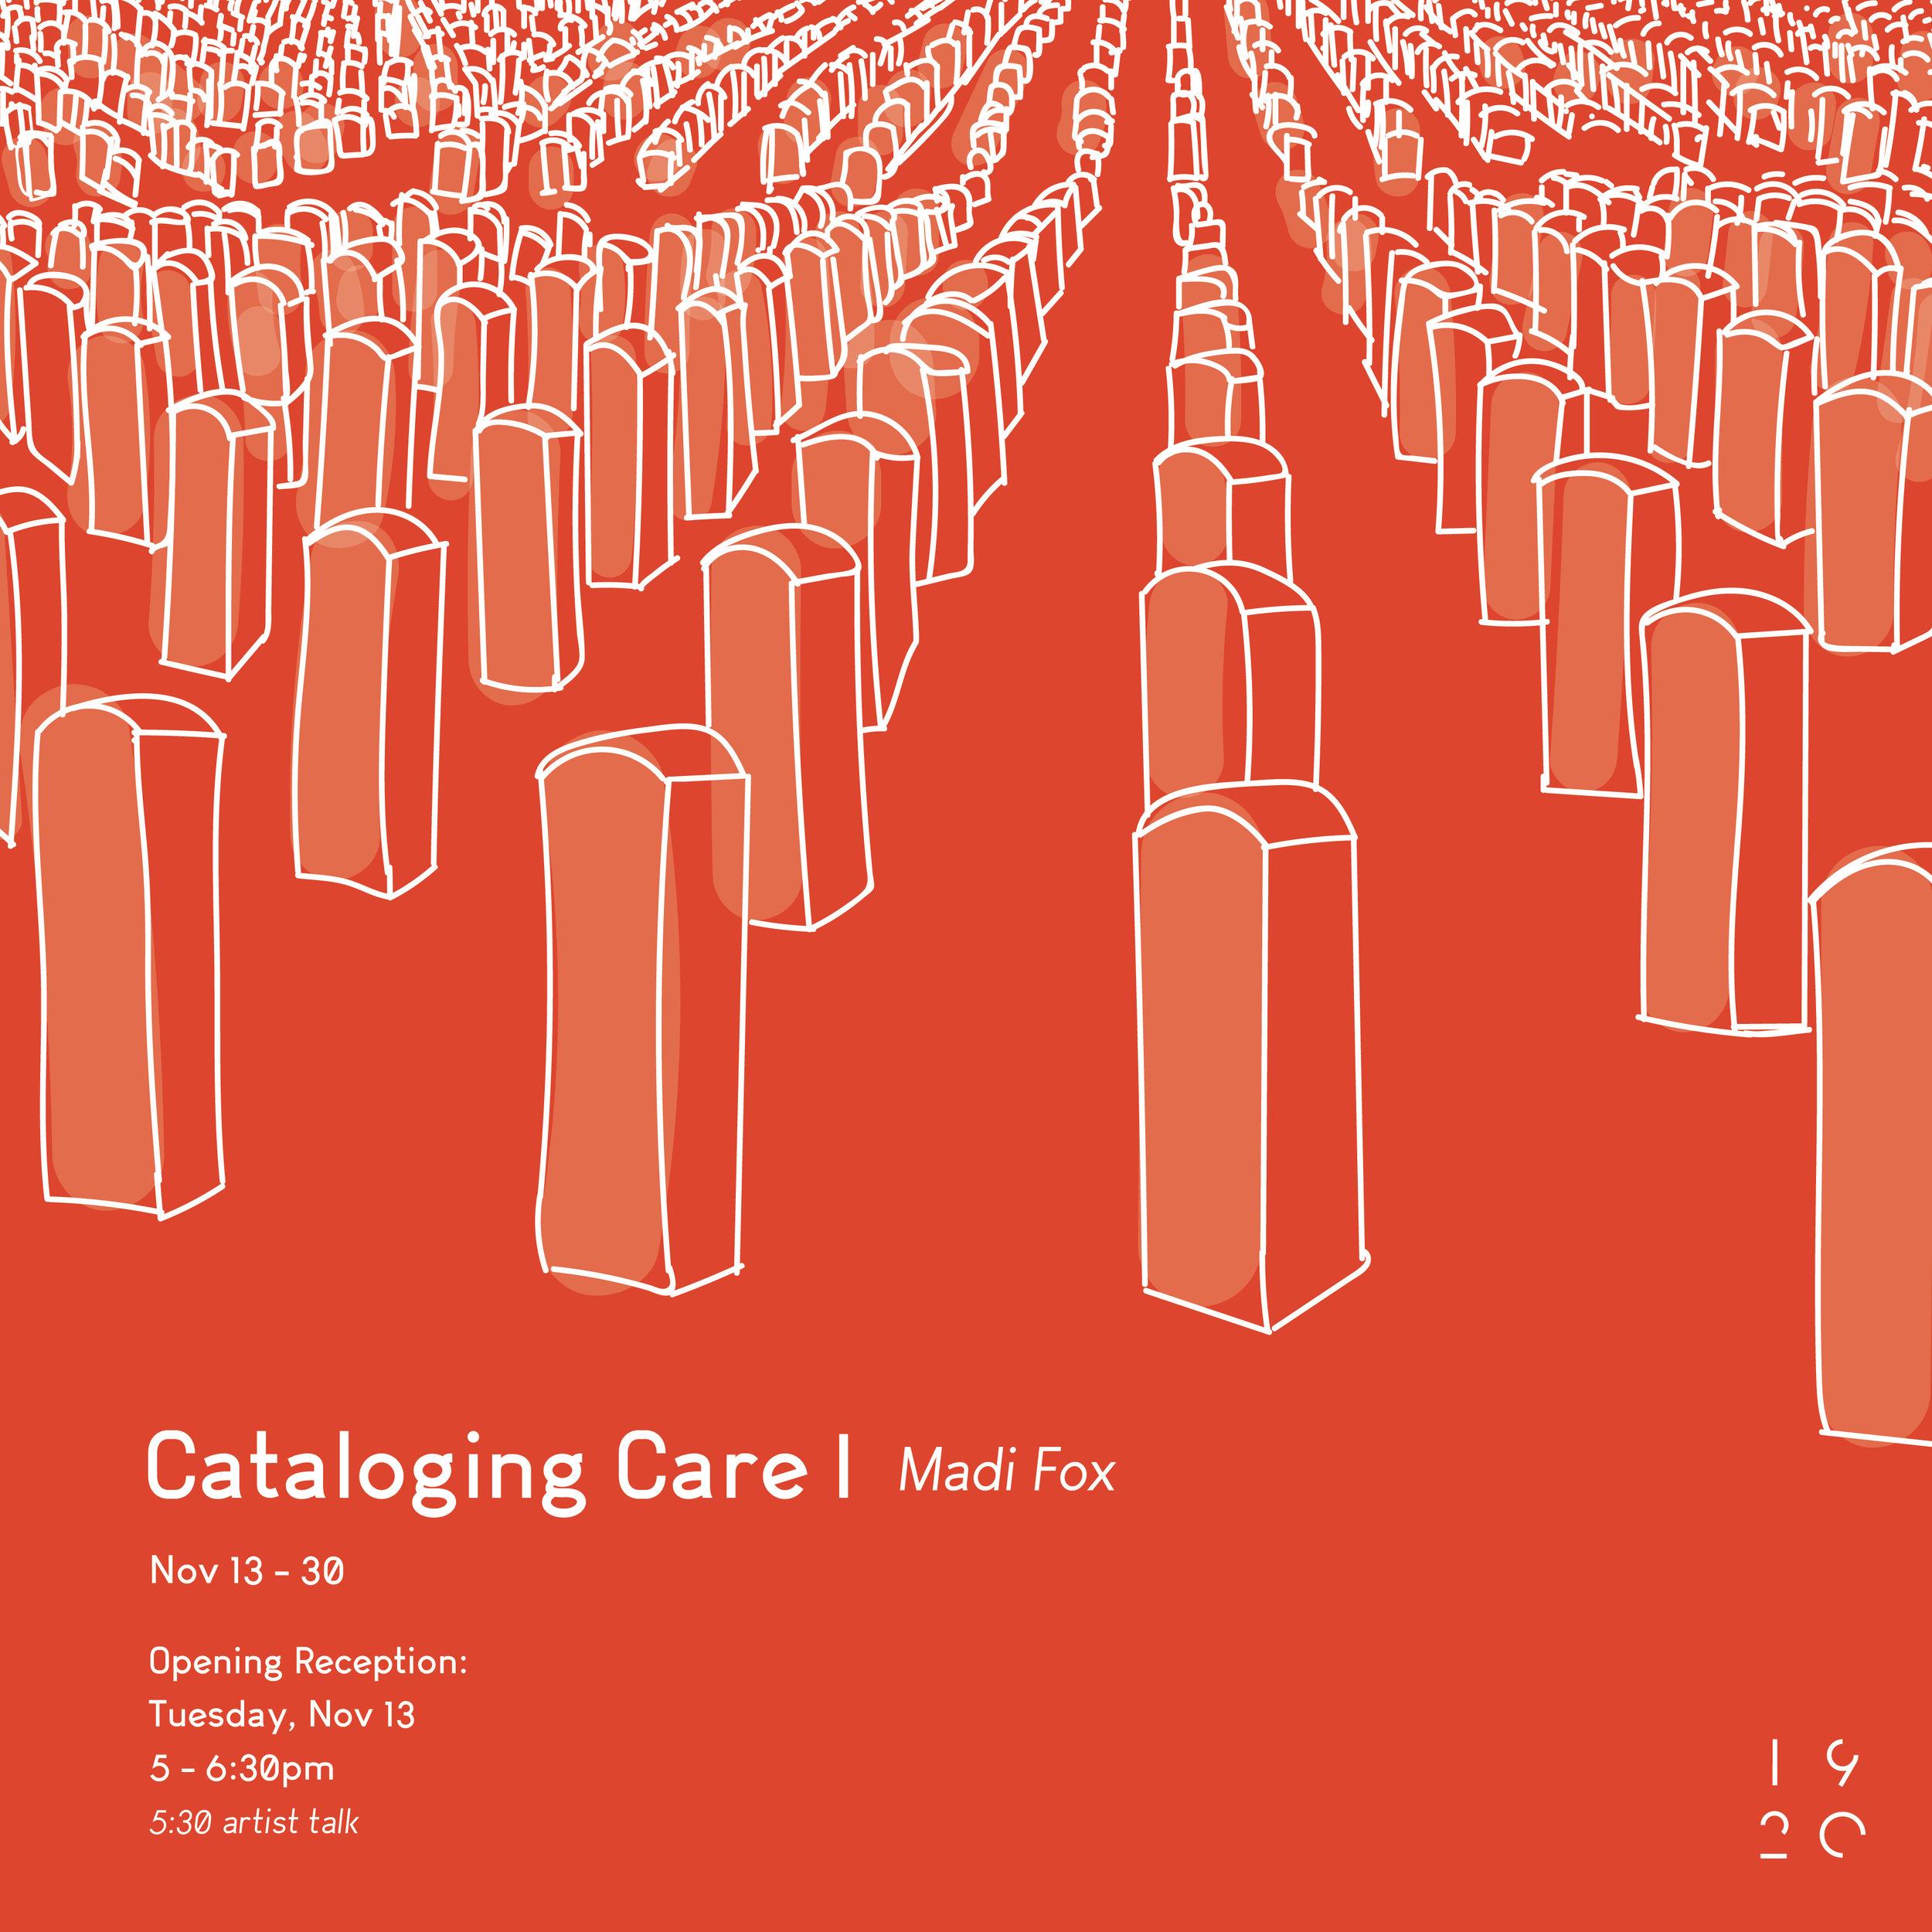 CATALOGING CARE - STUDENT SOLO | MADI FOXNOVEMBER 13 - NOVEMBER 30